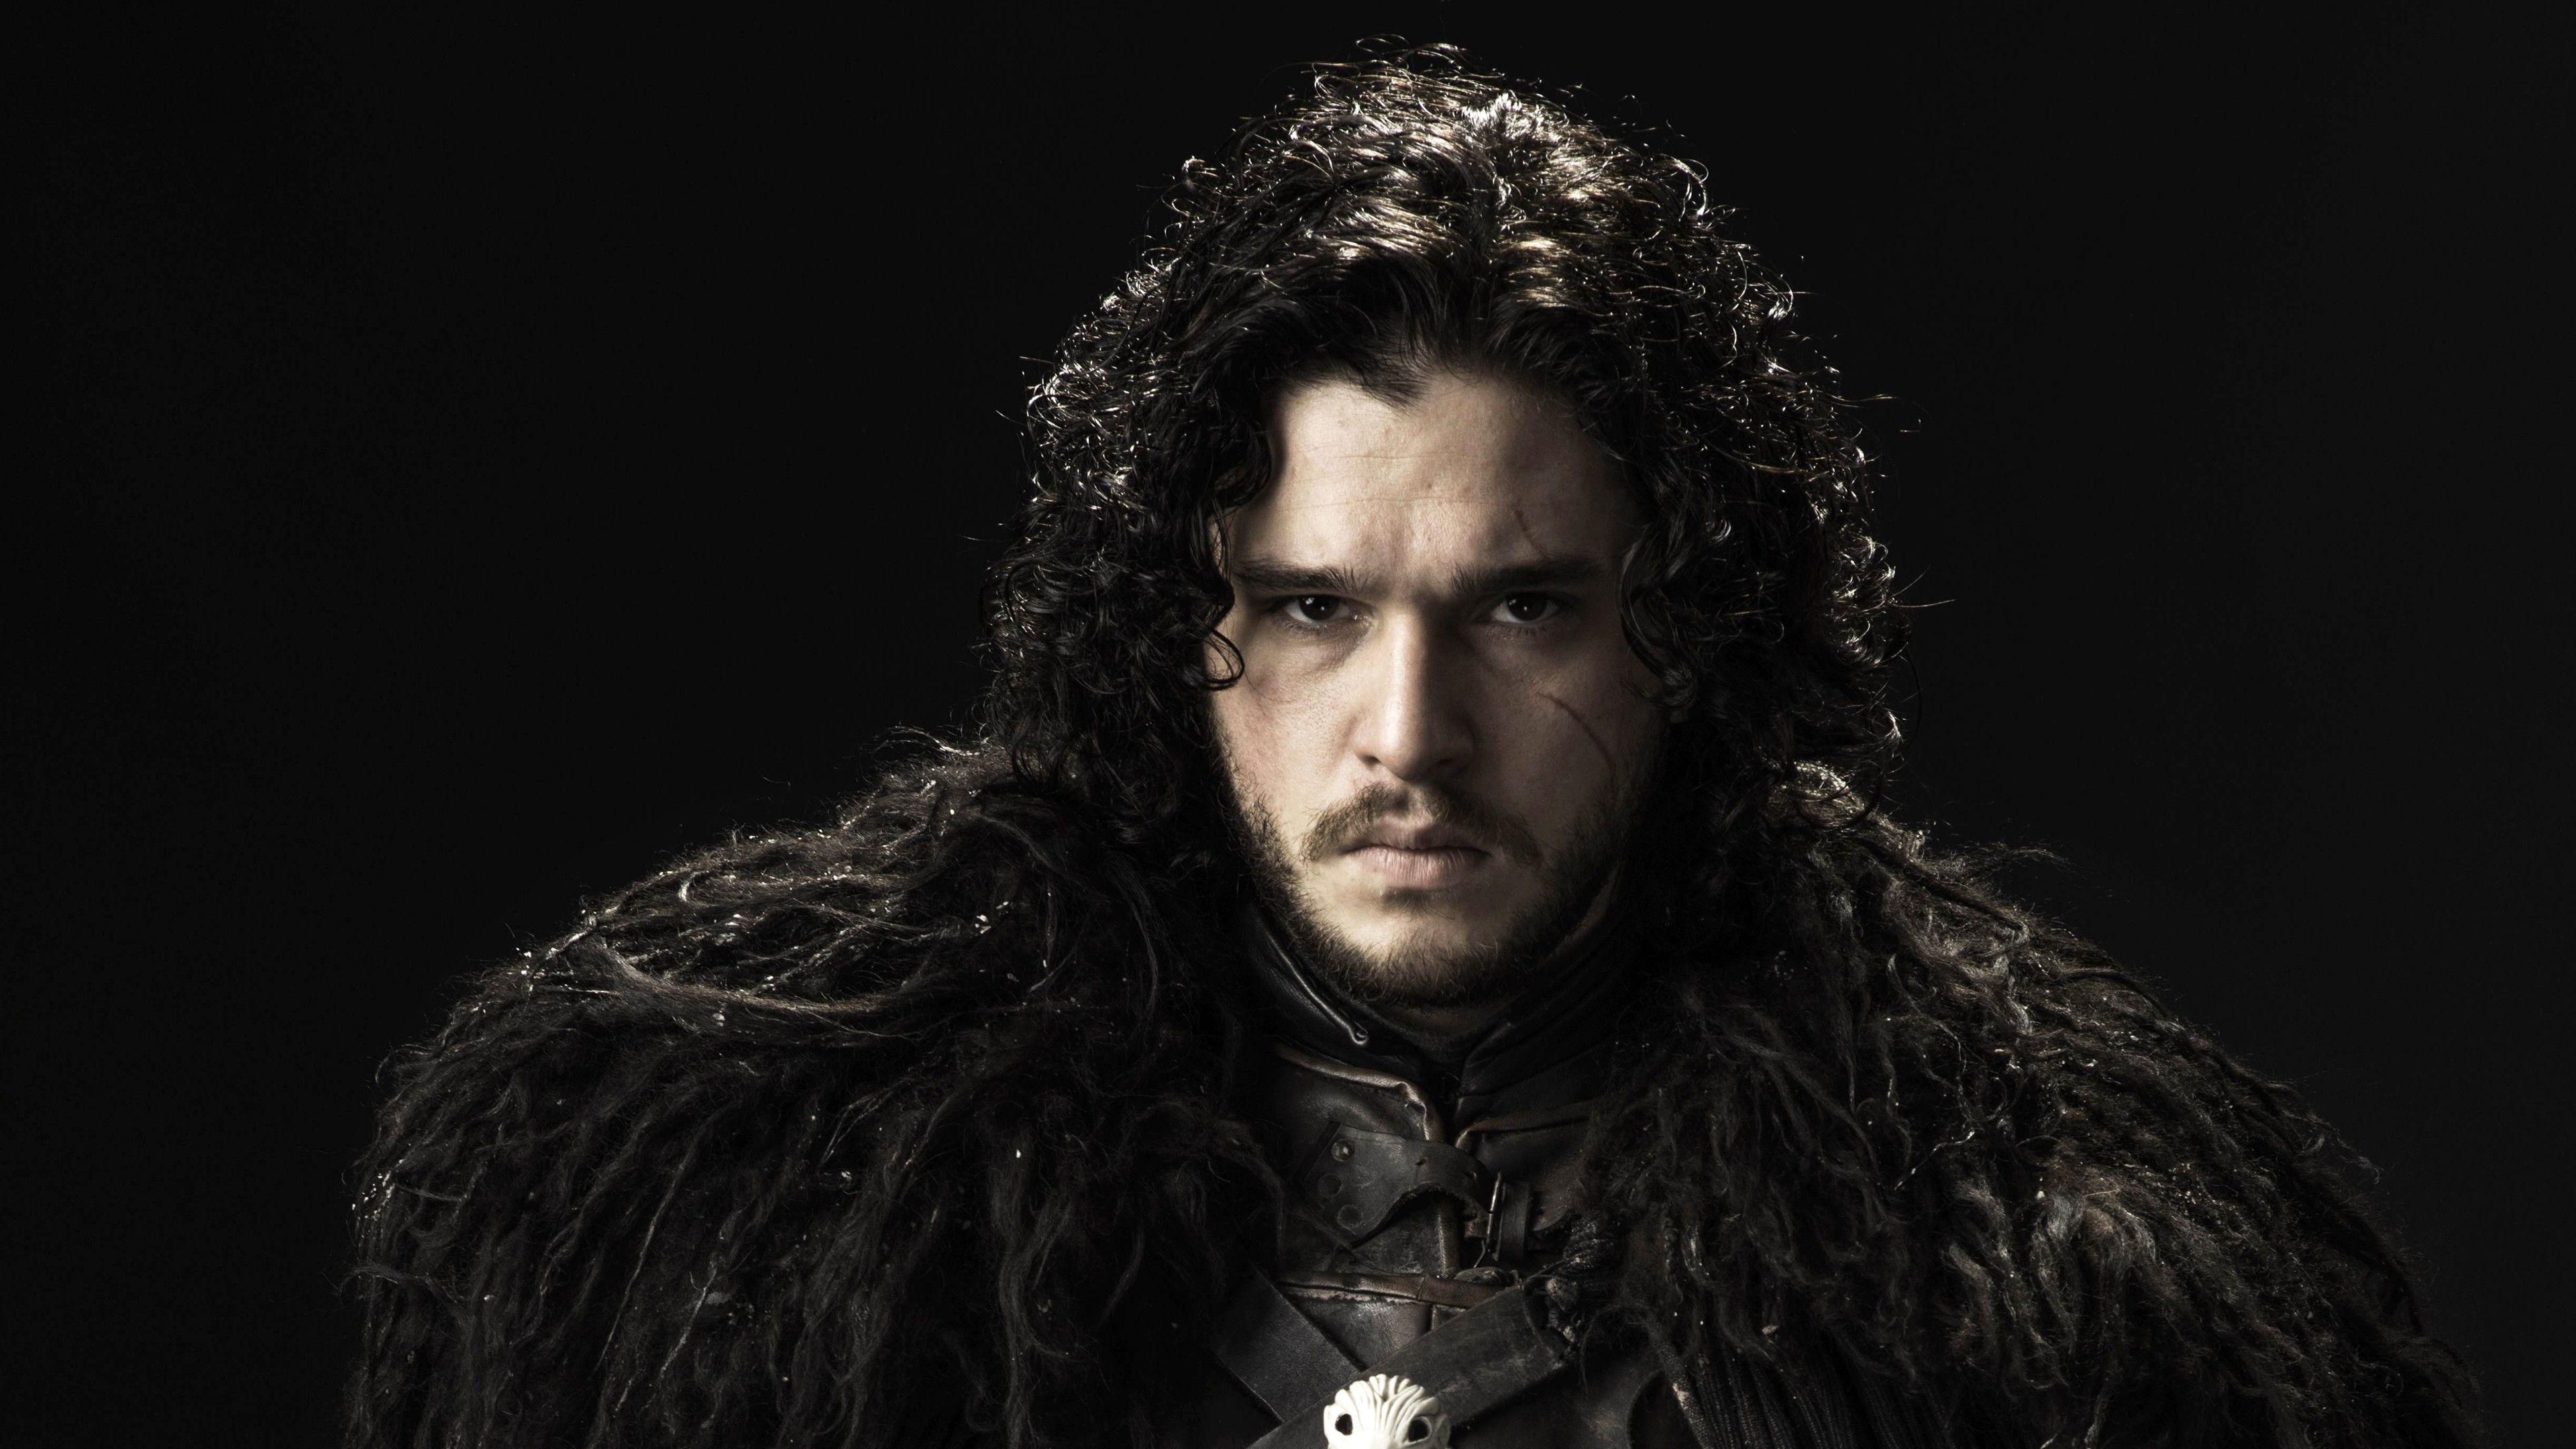 jon snow wallpaper Game of Thrones em 2019 Jon snow Jon snow 3840x2160